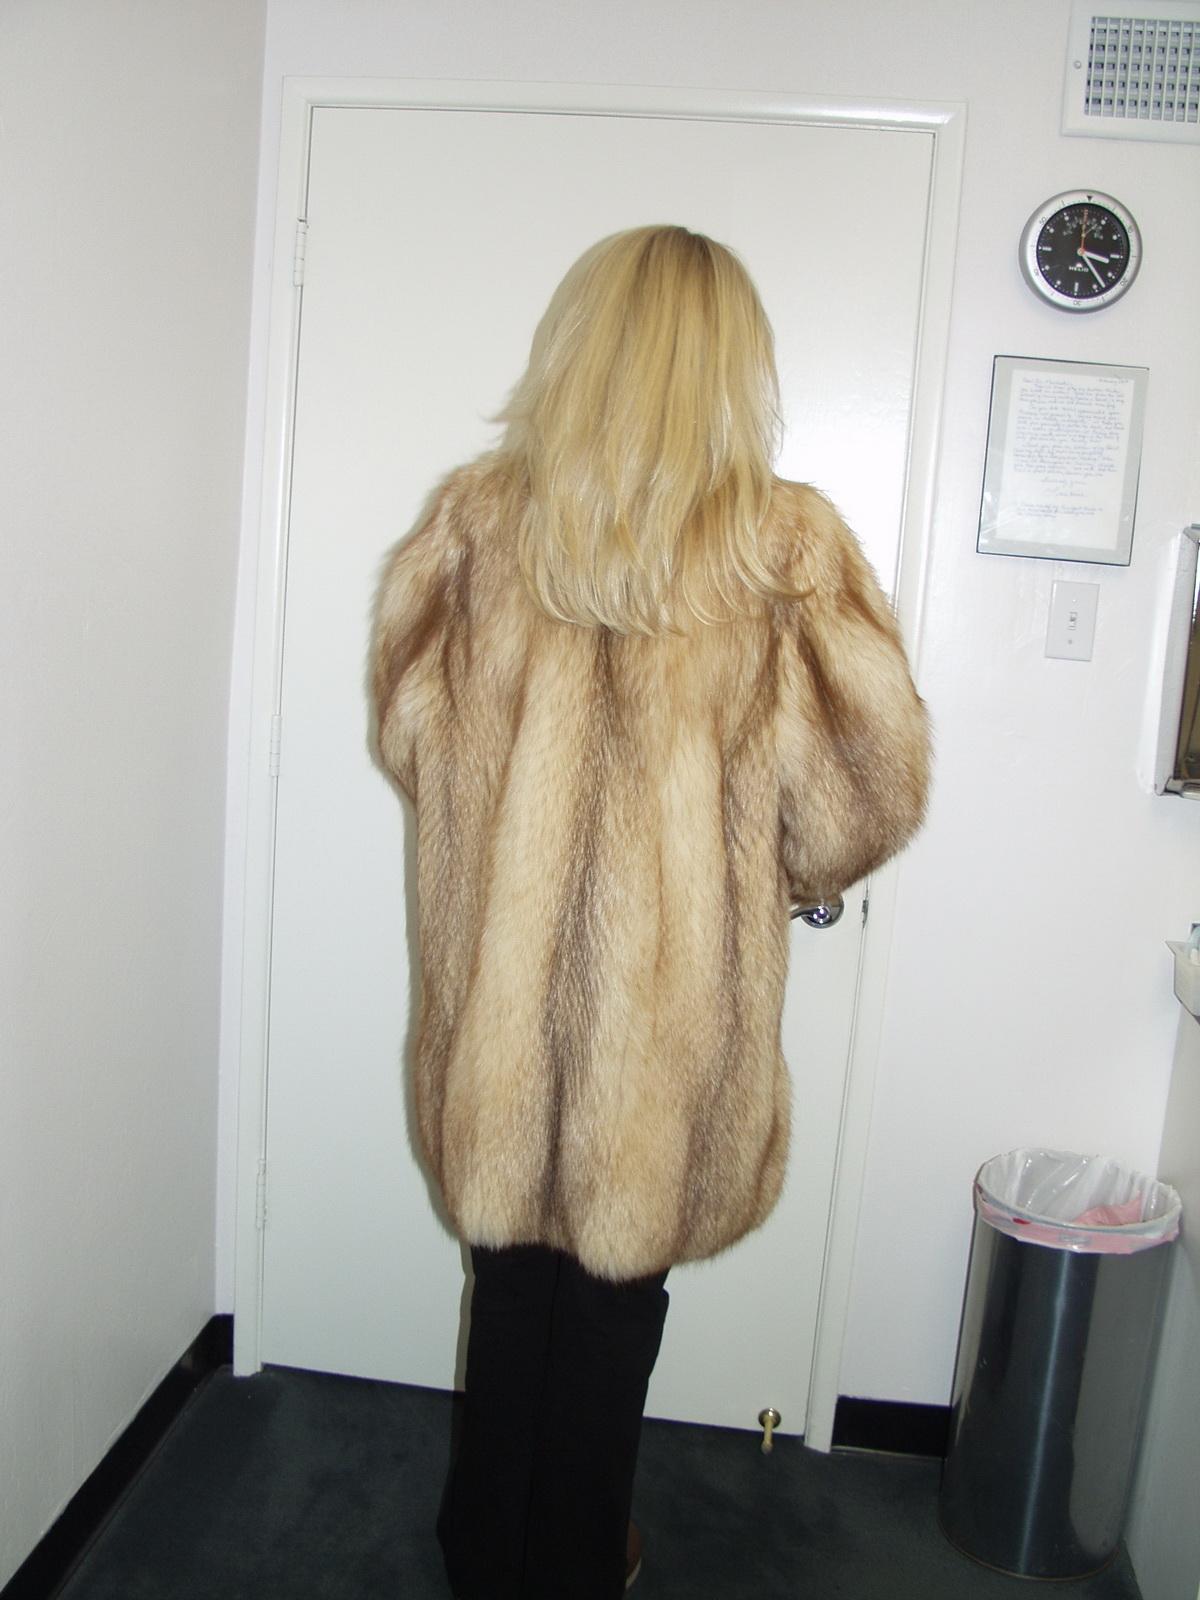 Fur coat teen hot amateur in park alone